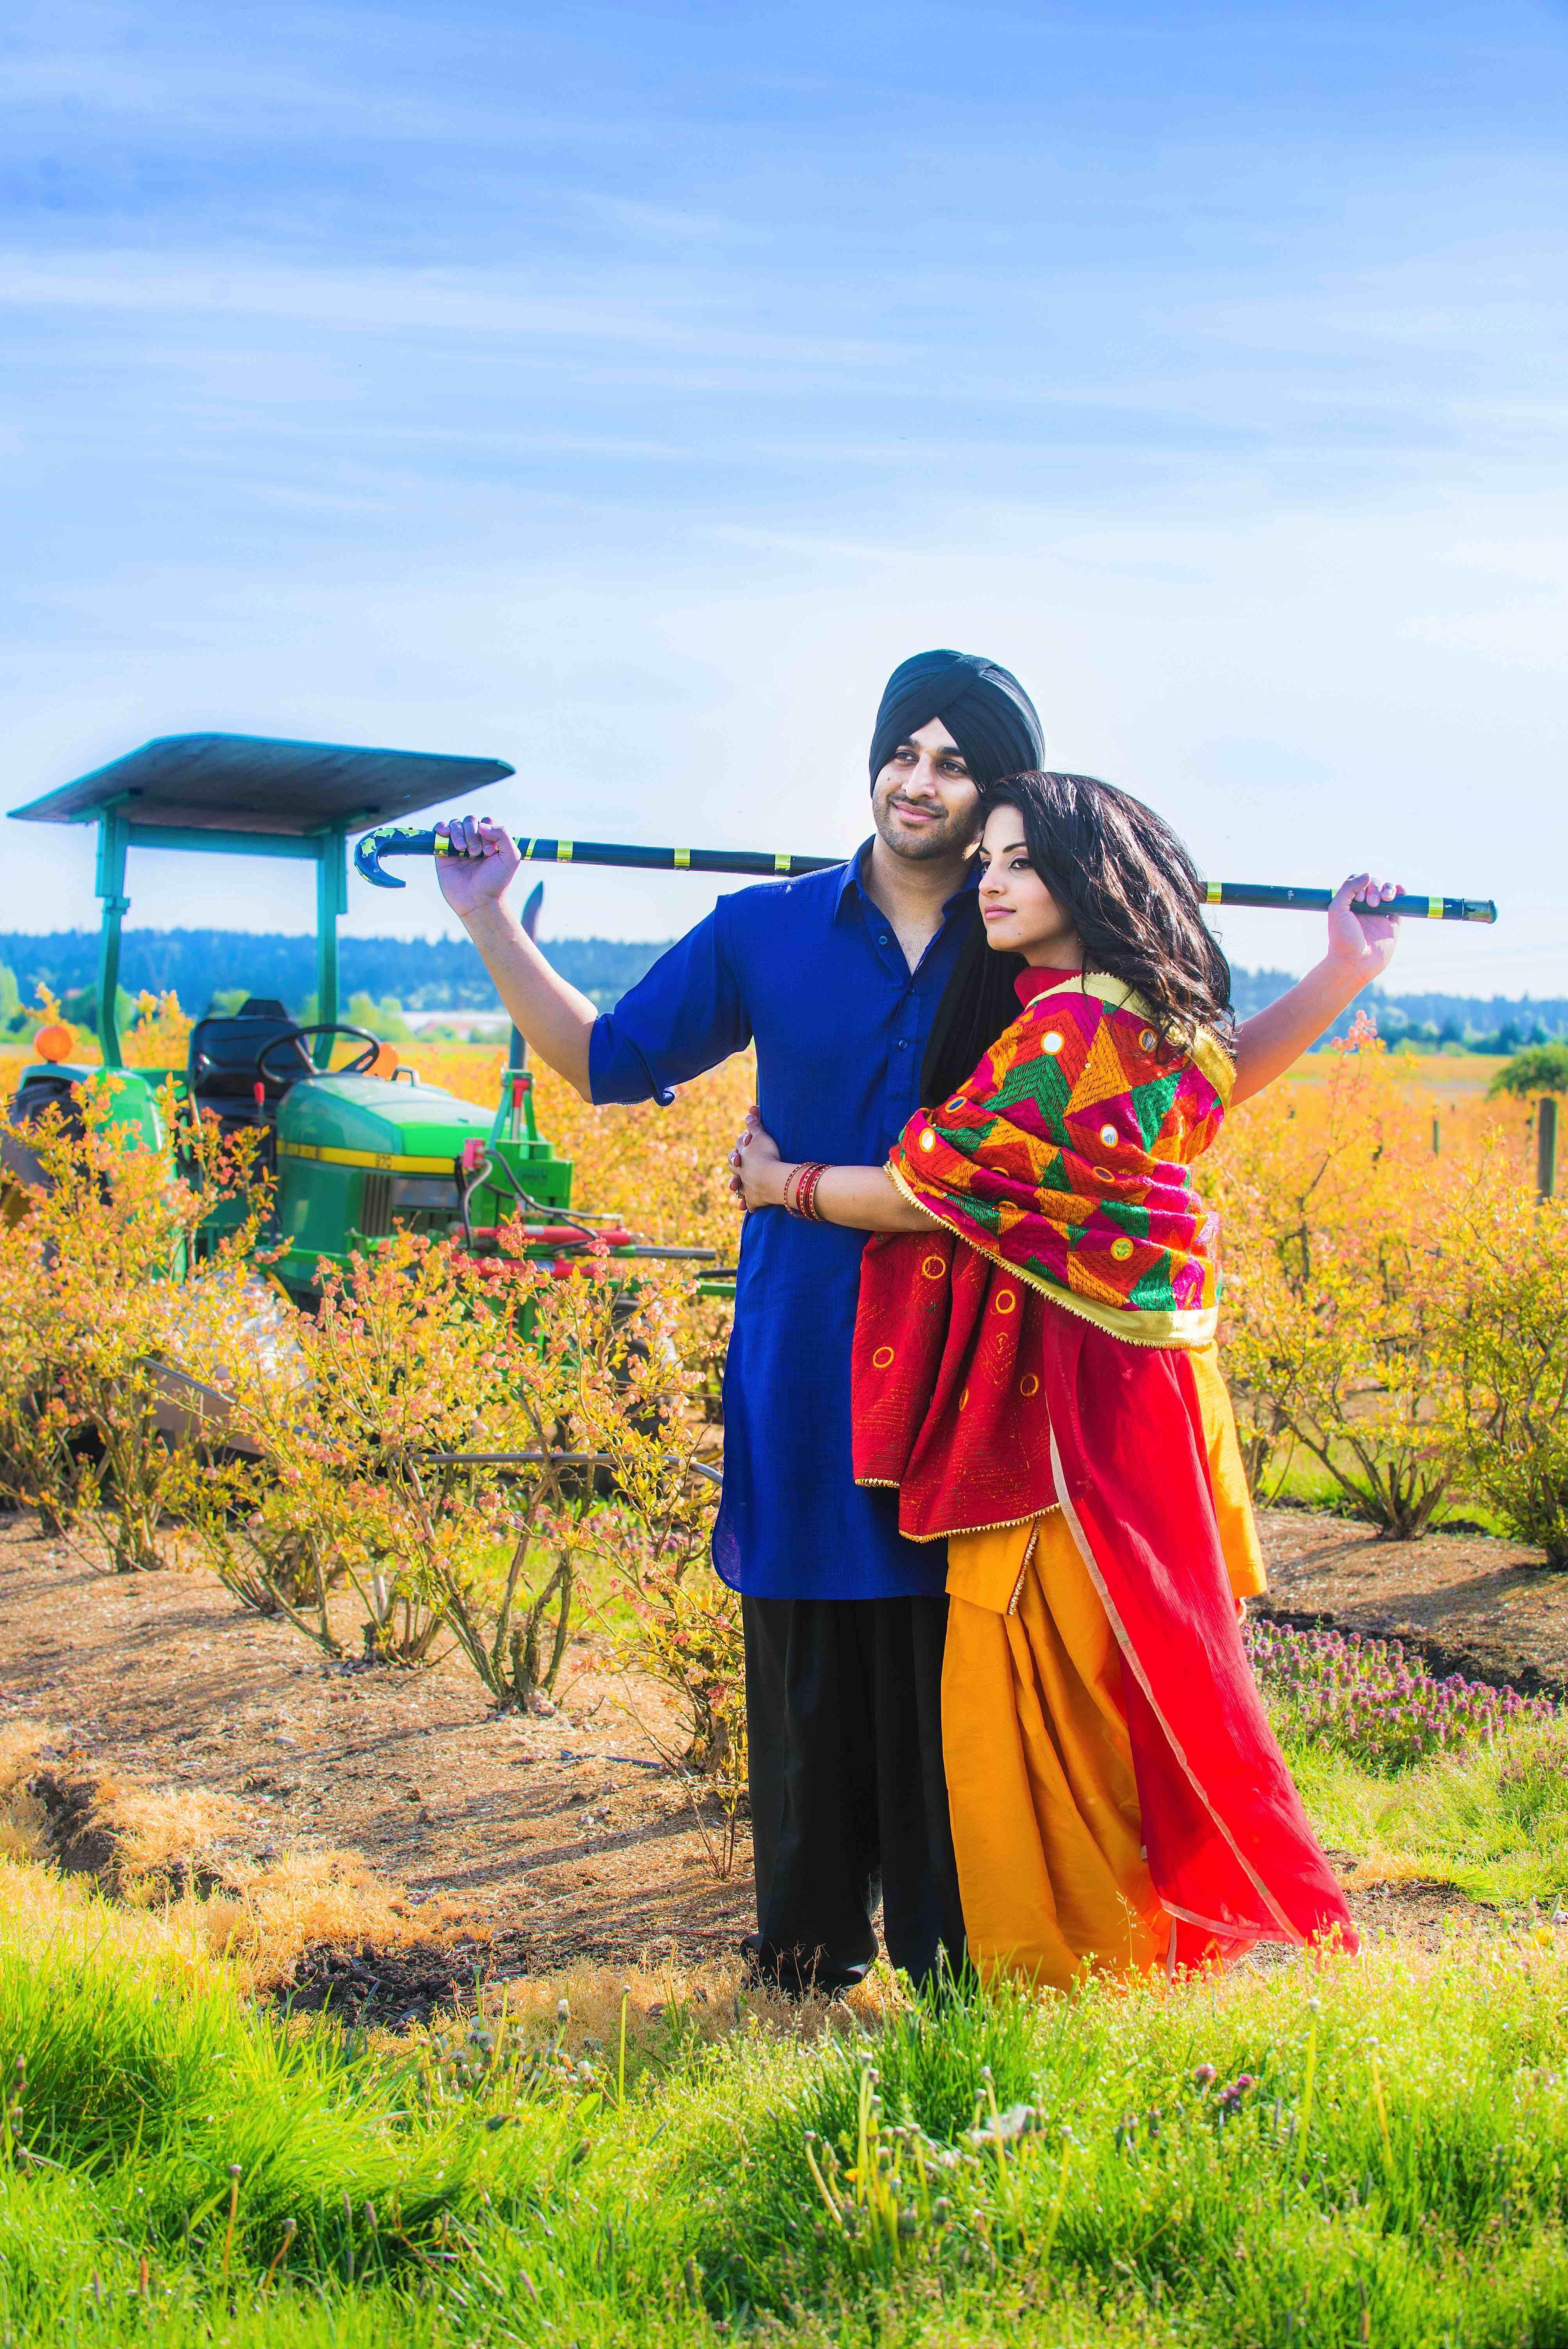 Pin by Kuldeep Gill on Punjabi Couple Culture 2017 in 2019 ...